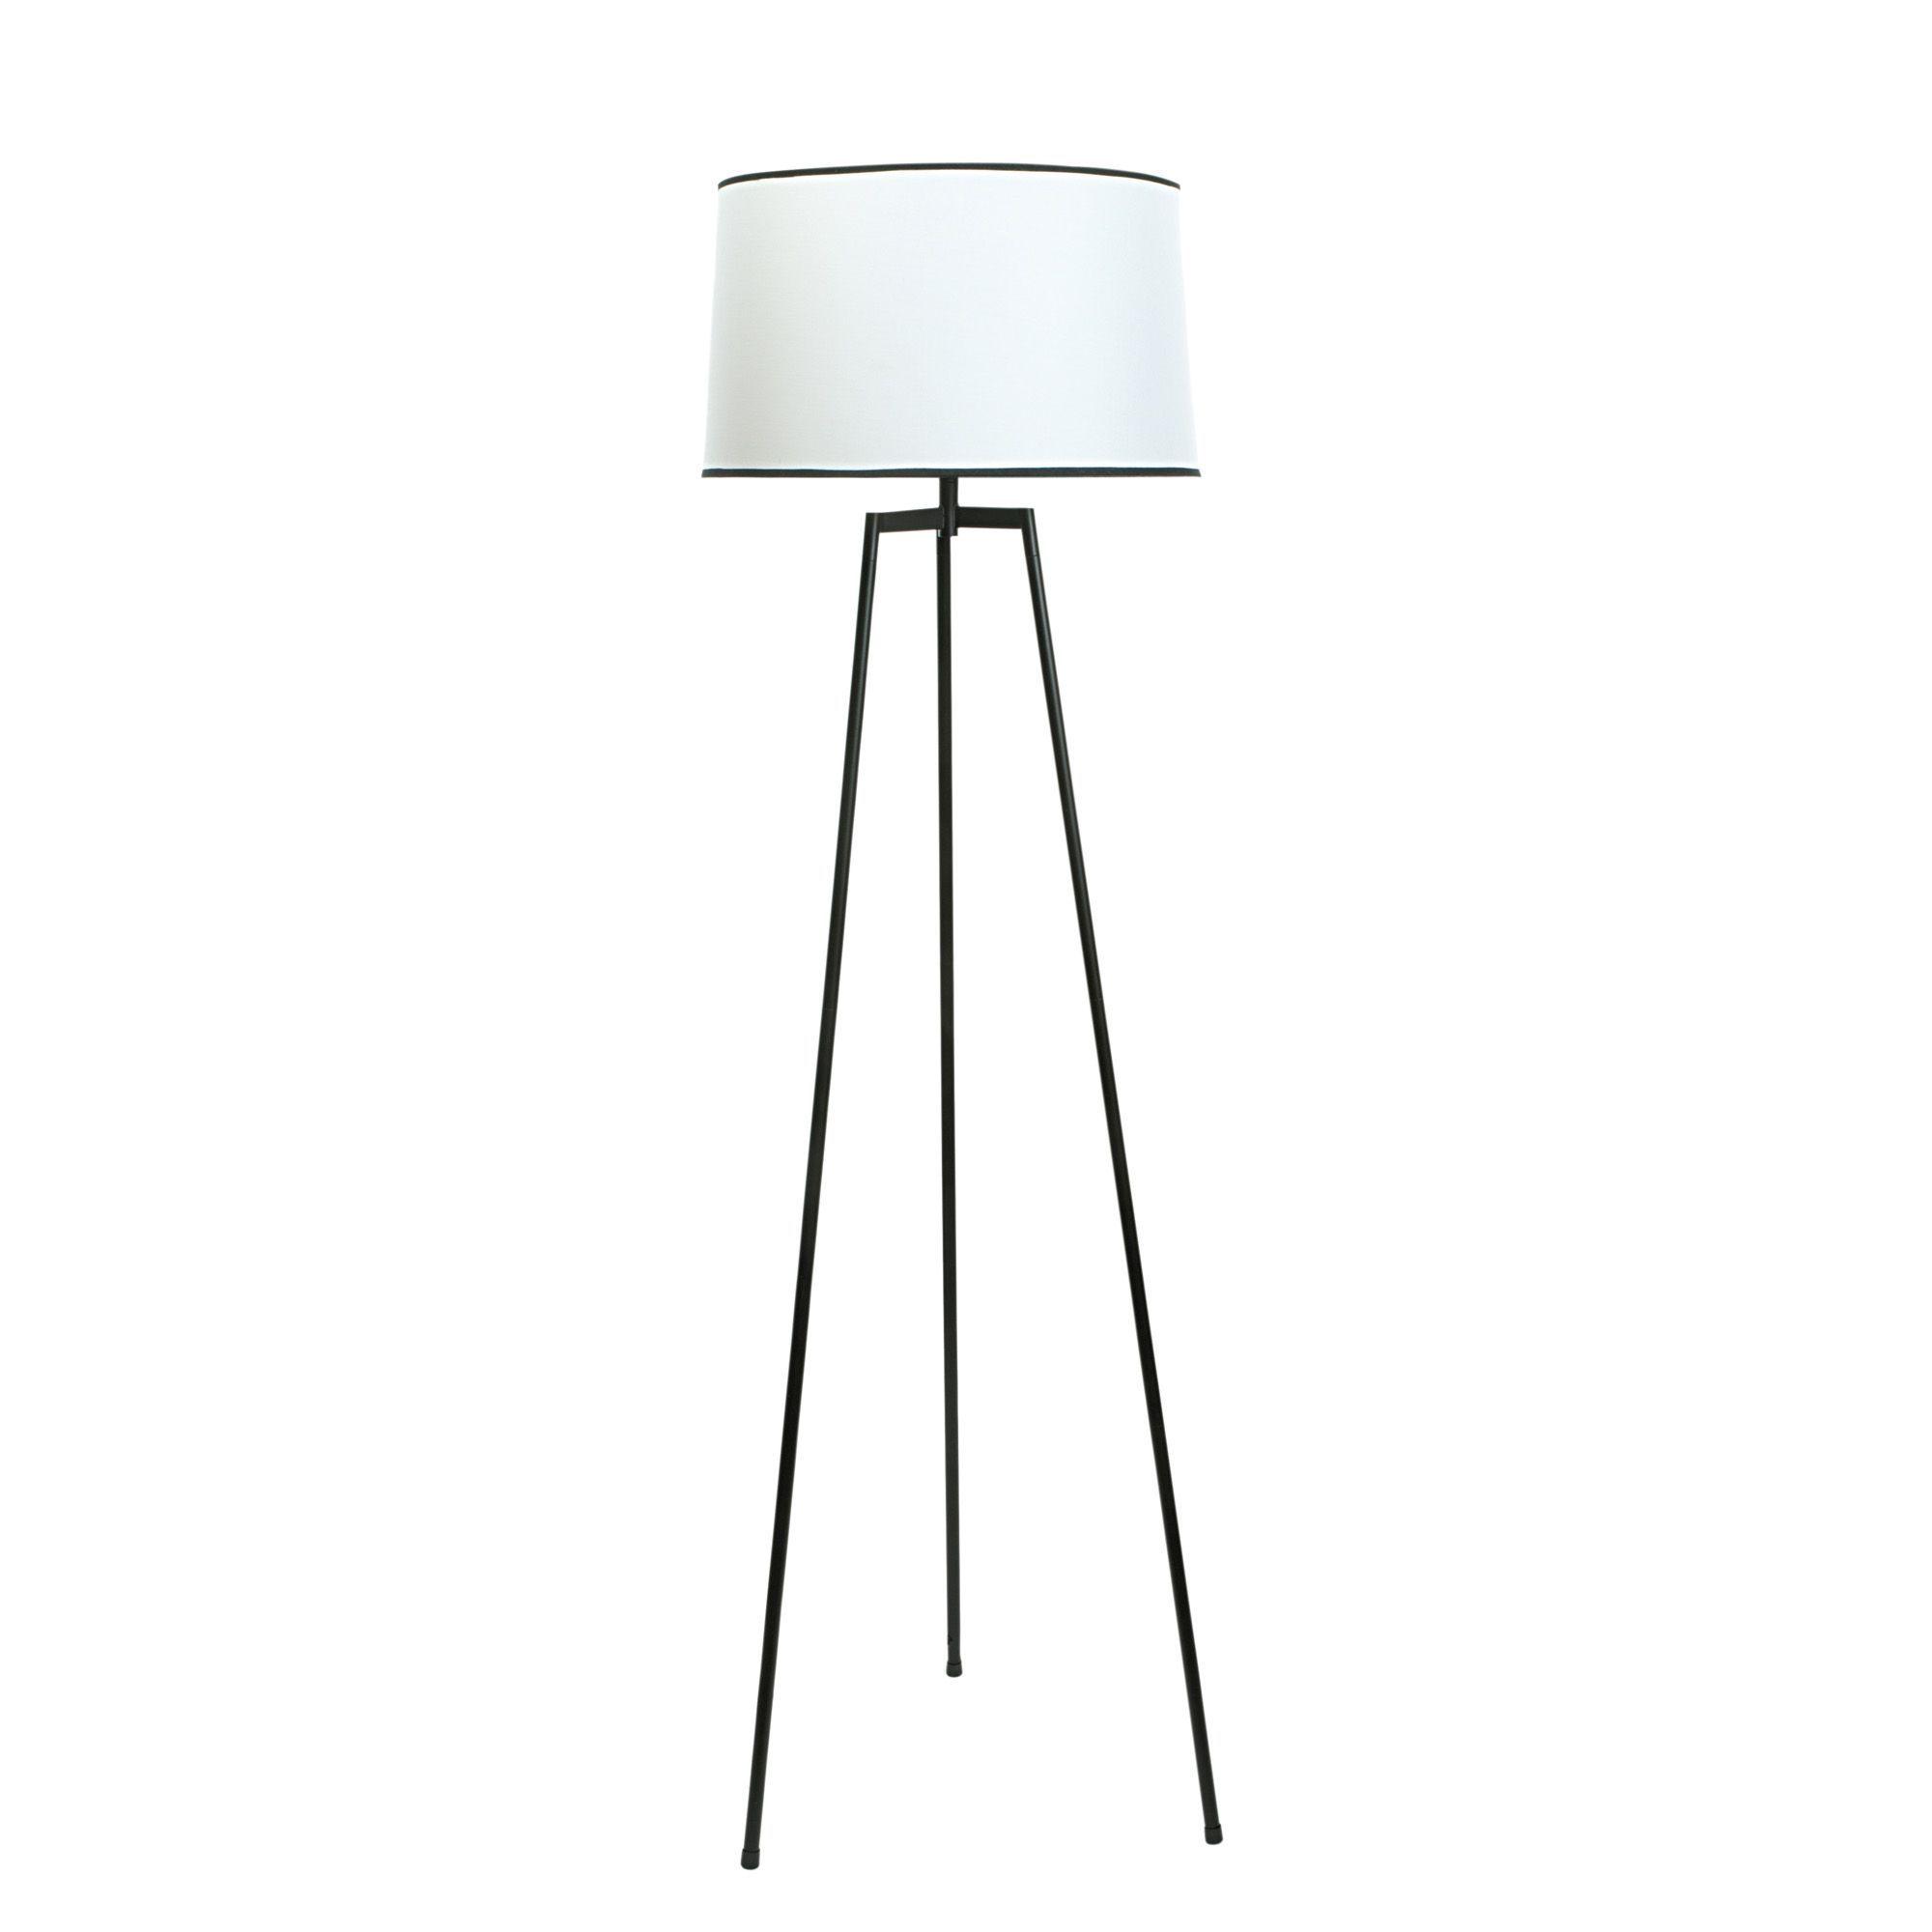 Harvey Black & Cream Floor Lamp | Floor lamp, Lamp ideas and Room lamp